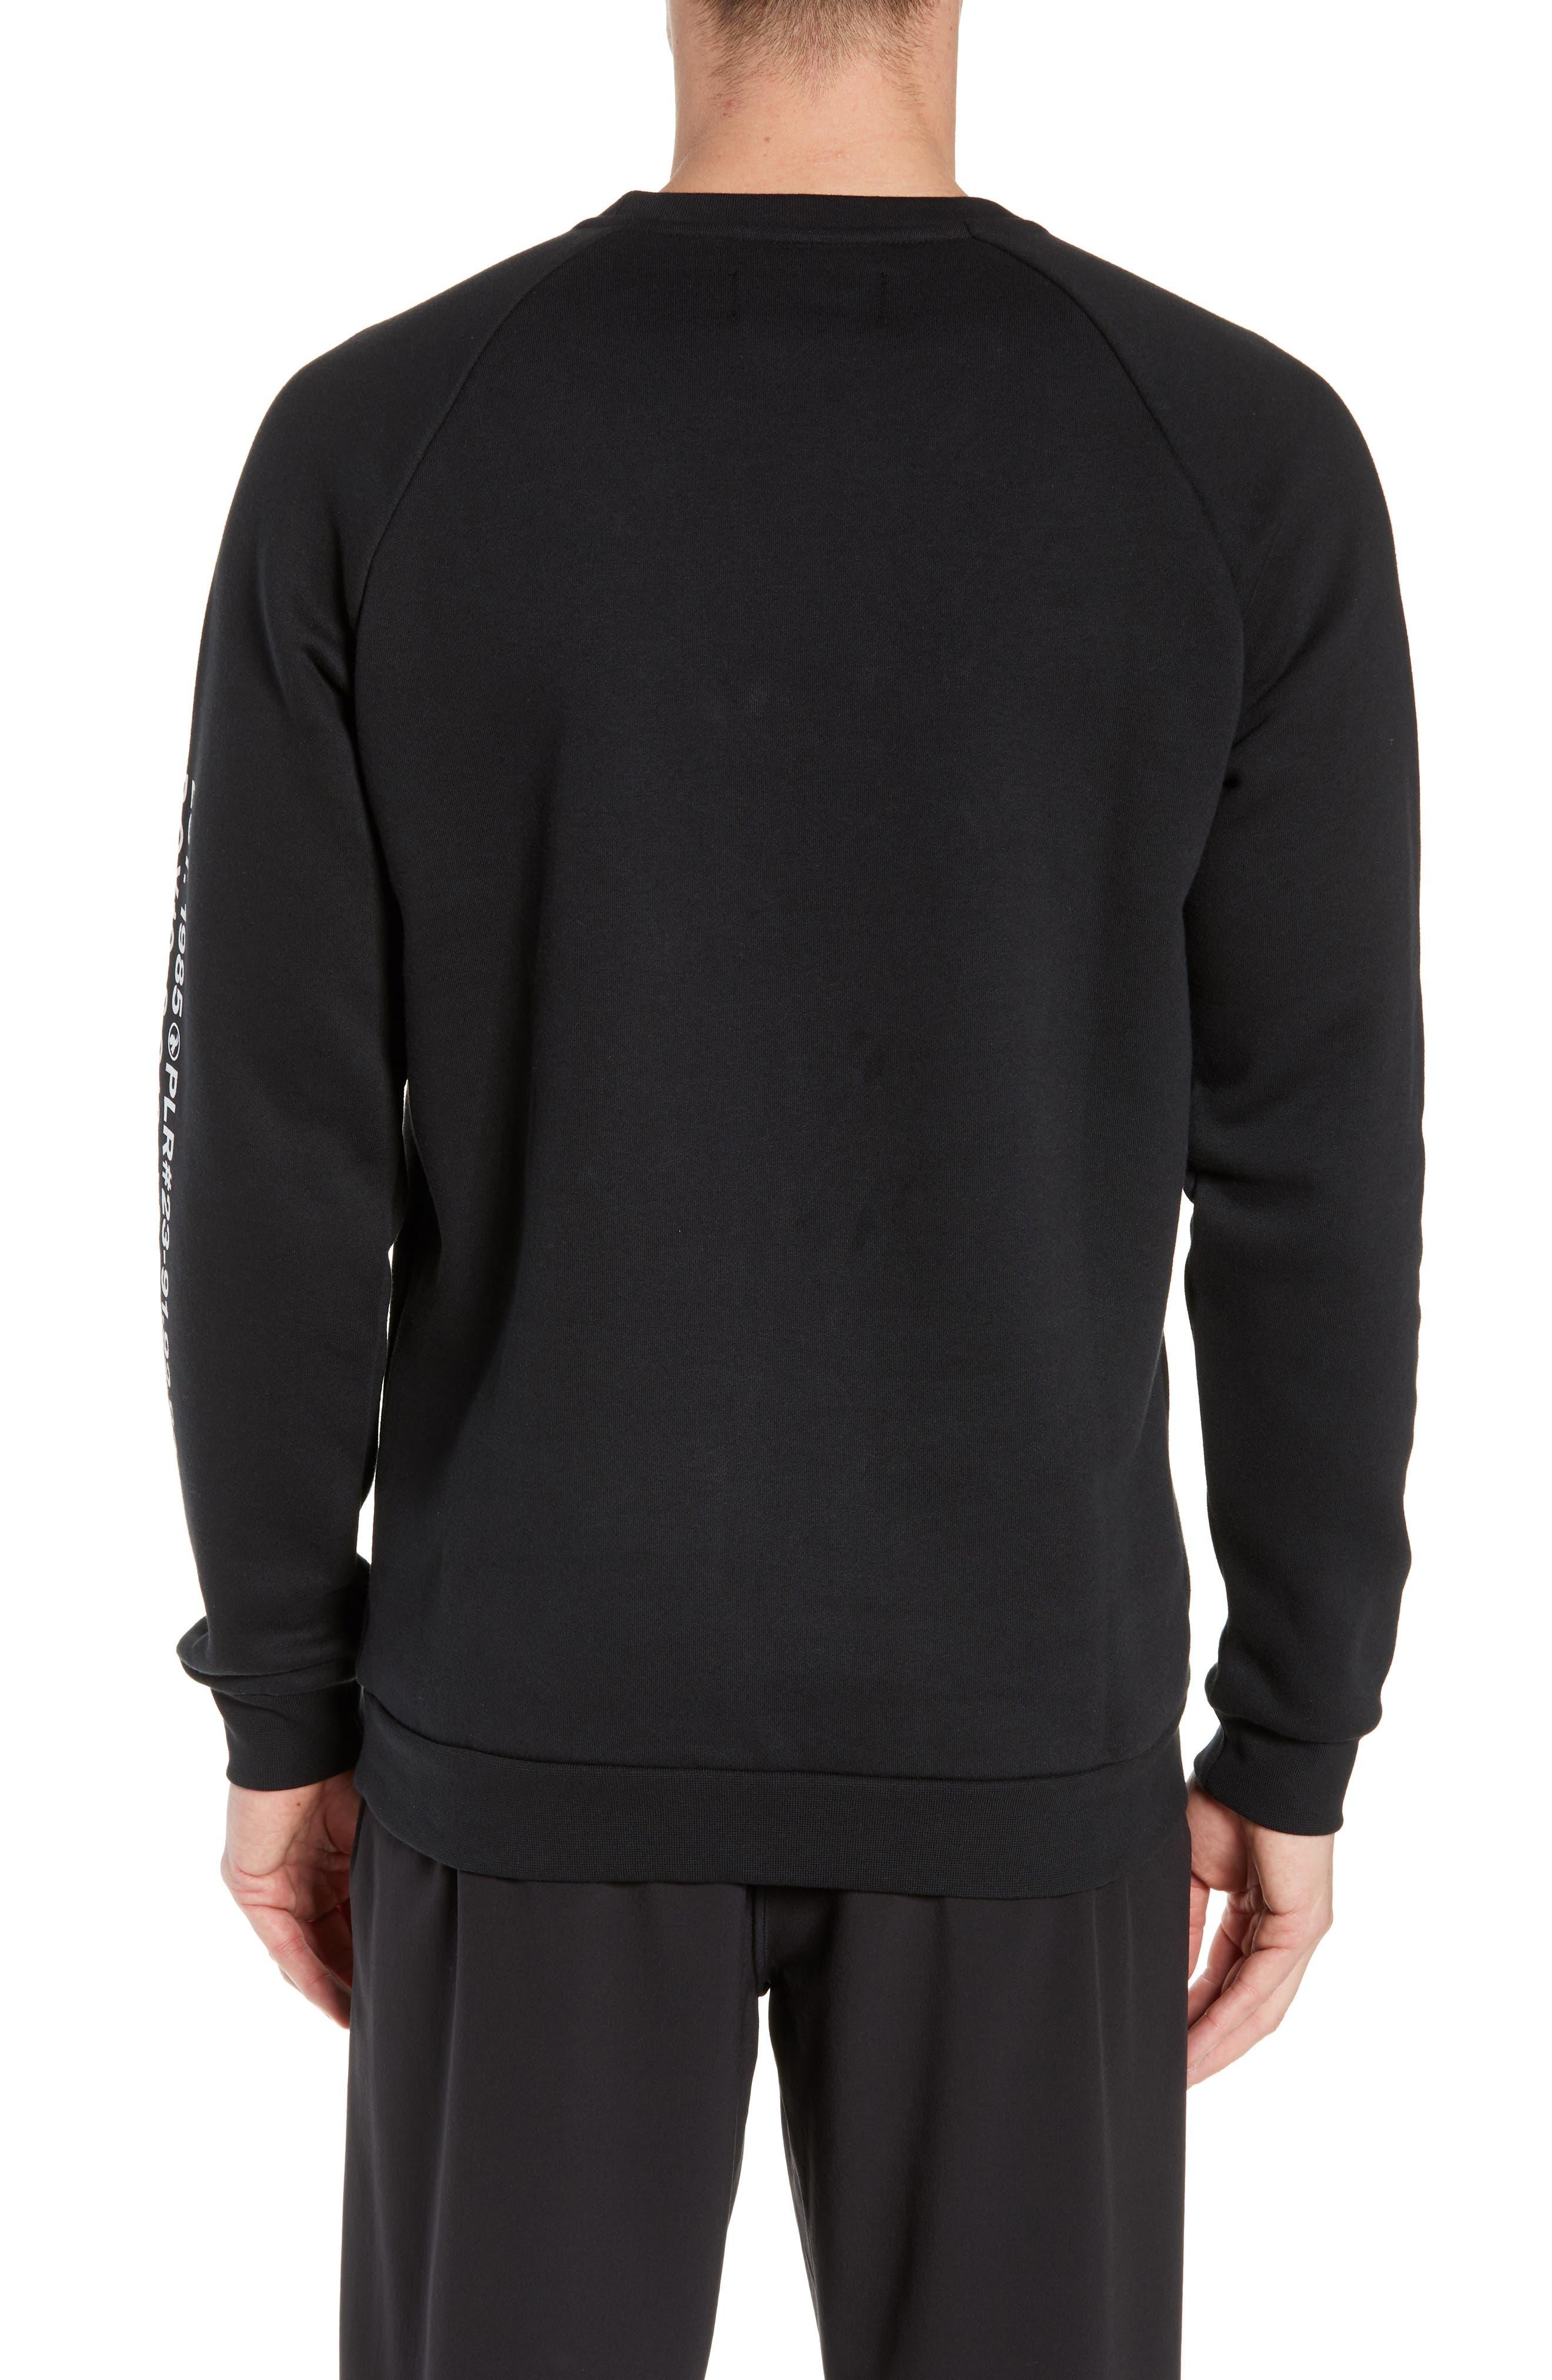 JORDAN, JSW Greatest Stats Graphic Sweatshirt, Alternate thumbnail 2, color, BLACK